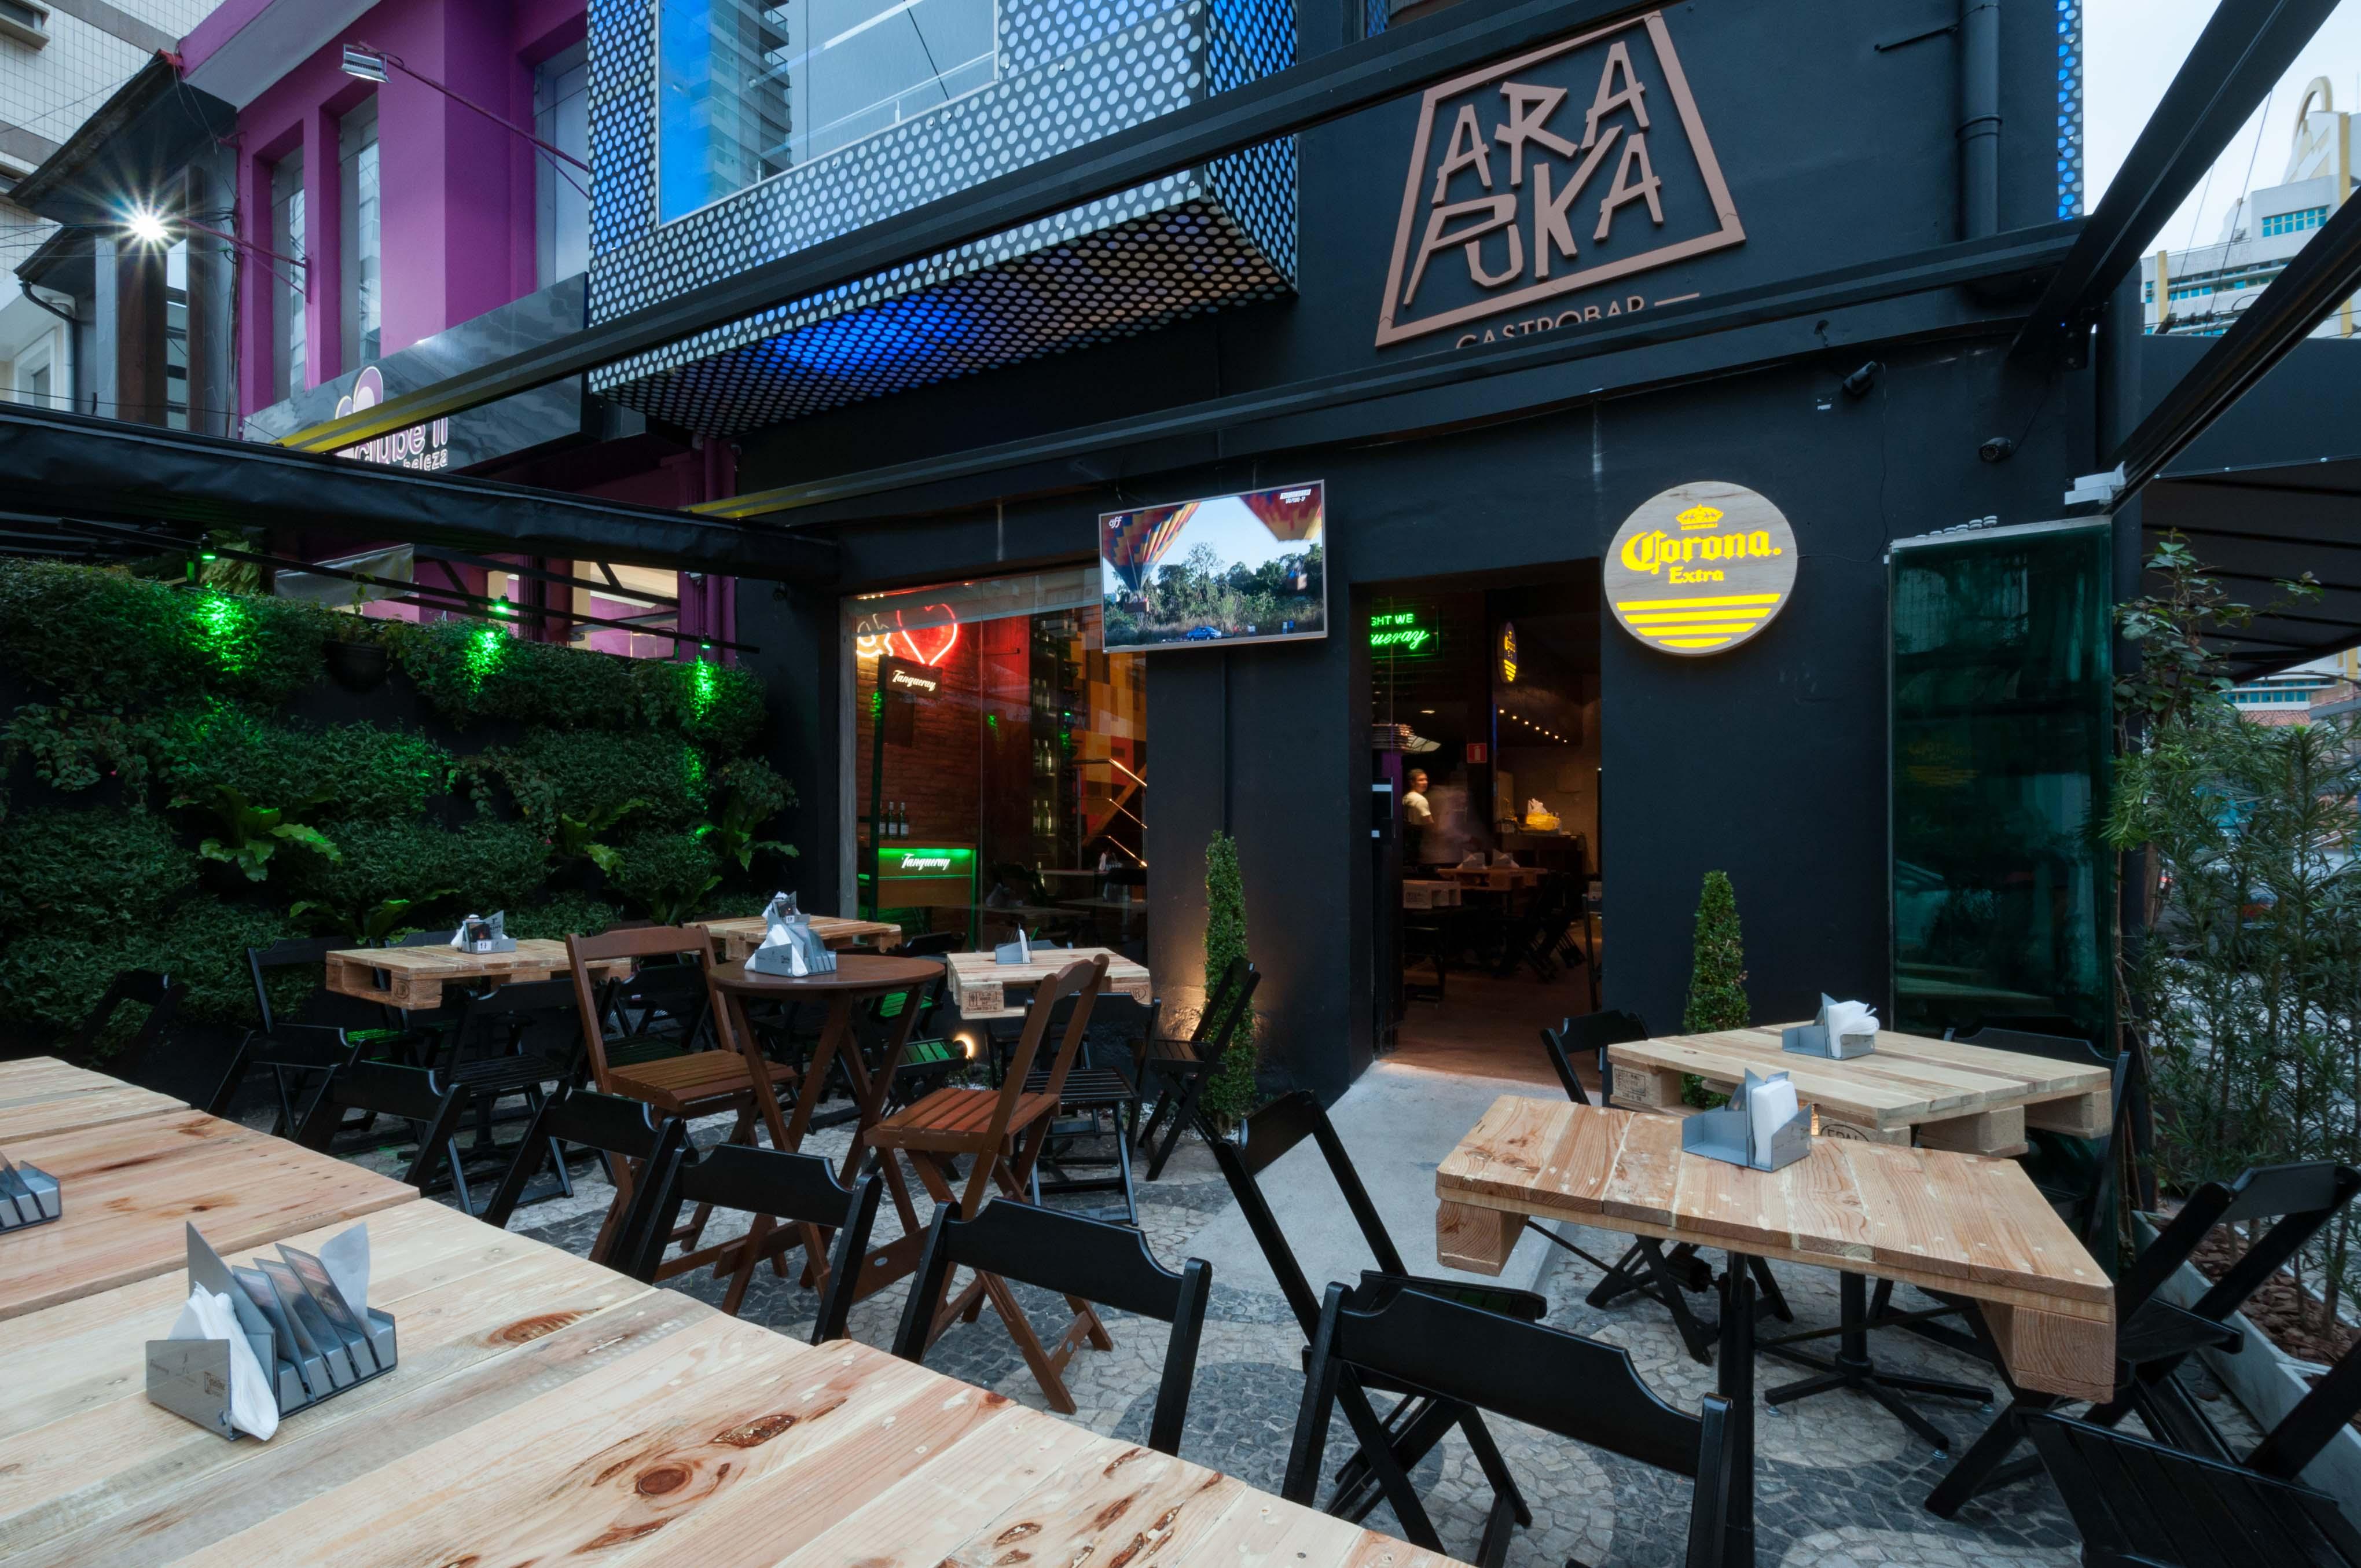 arapuka-gastro-bar-jardim-vertical